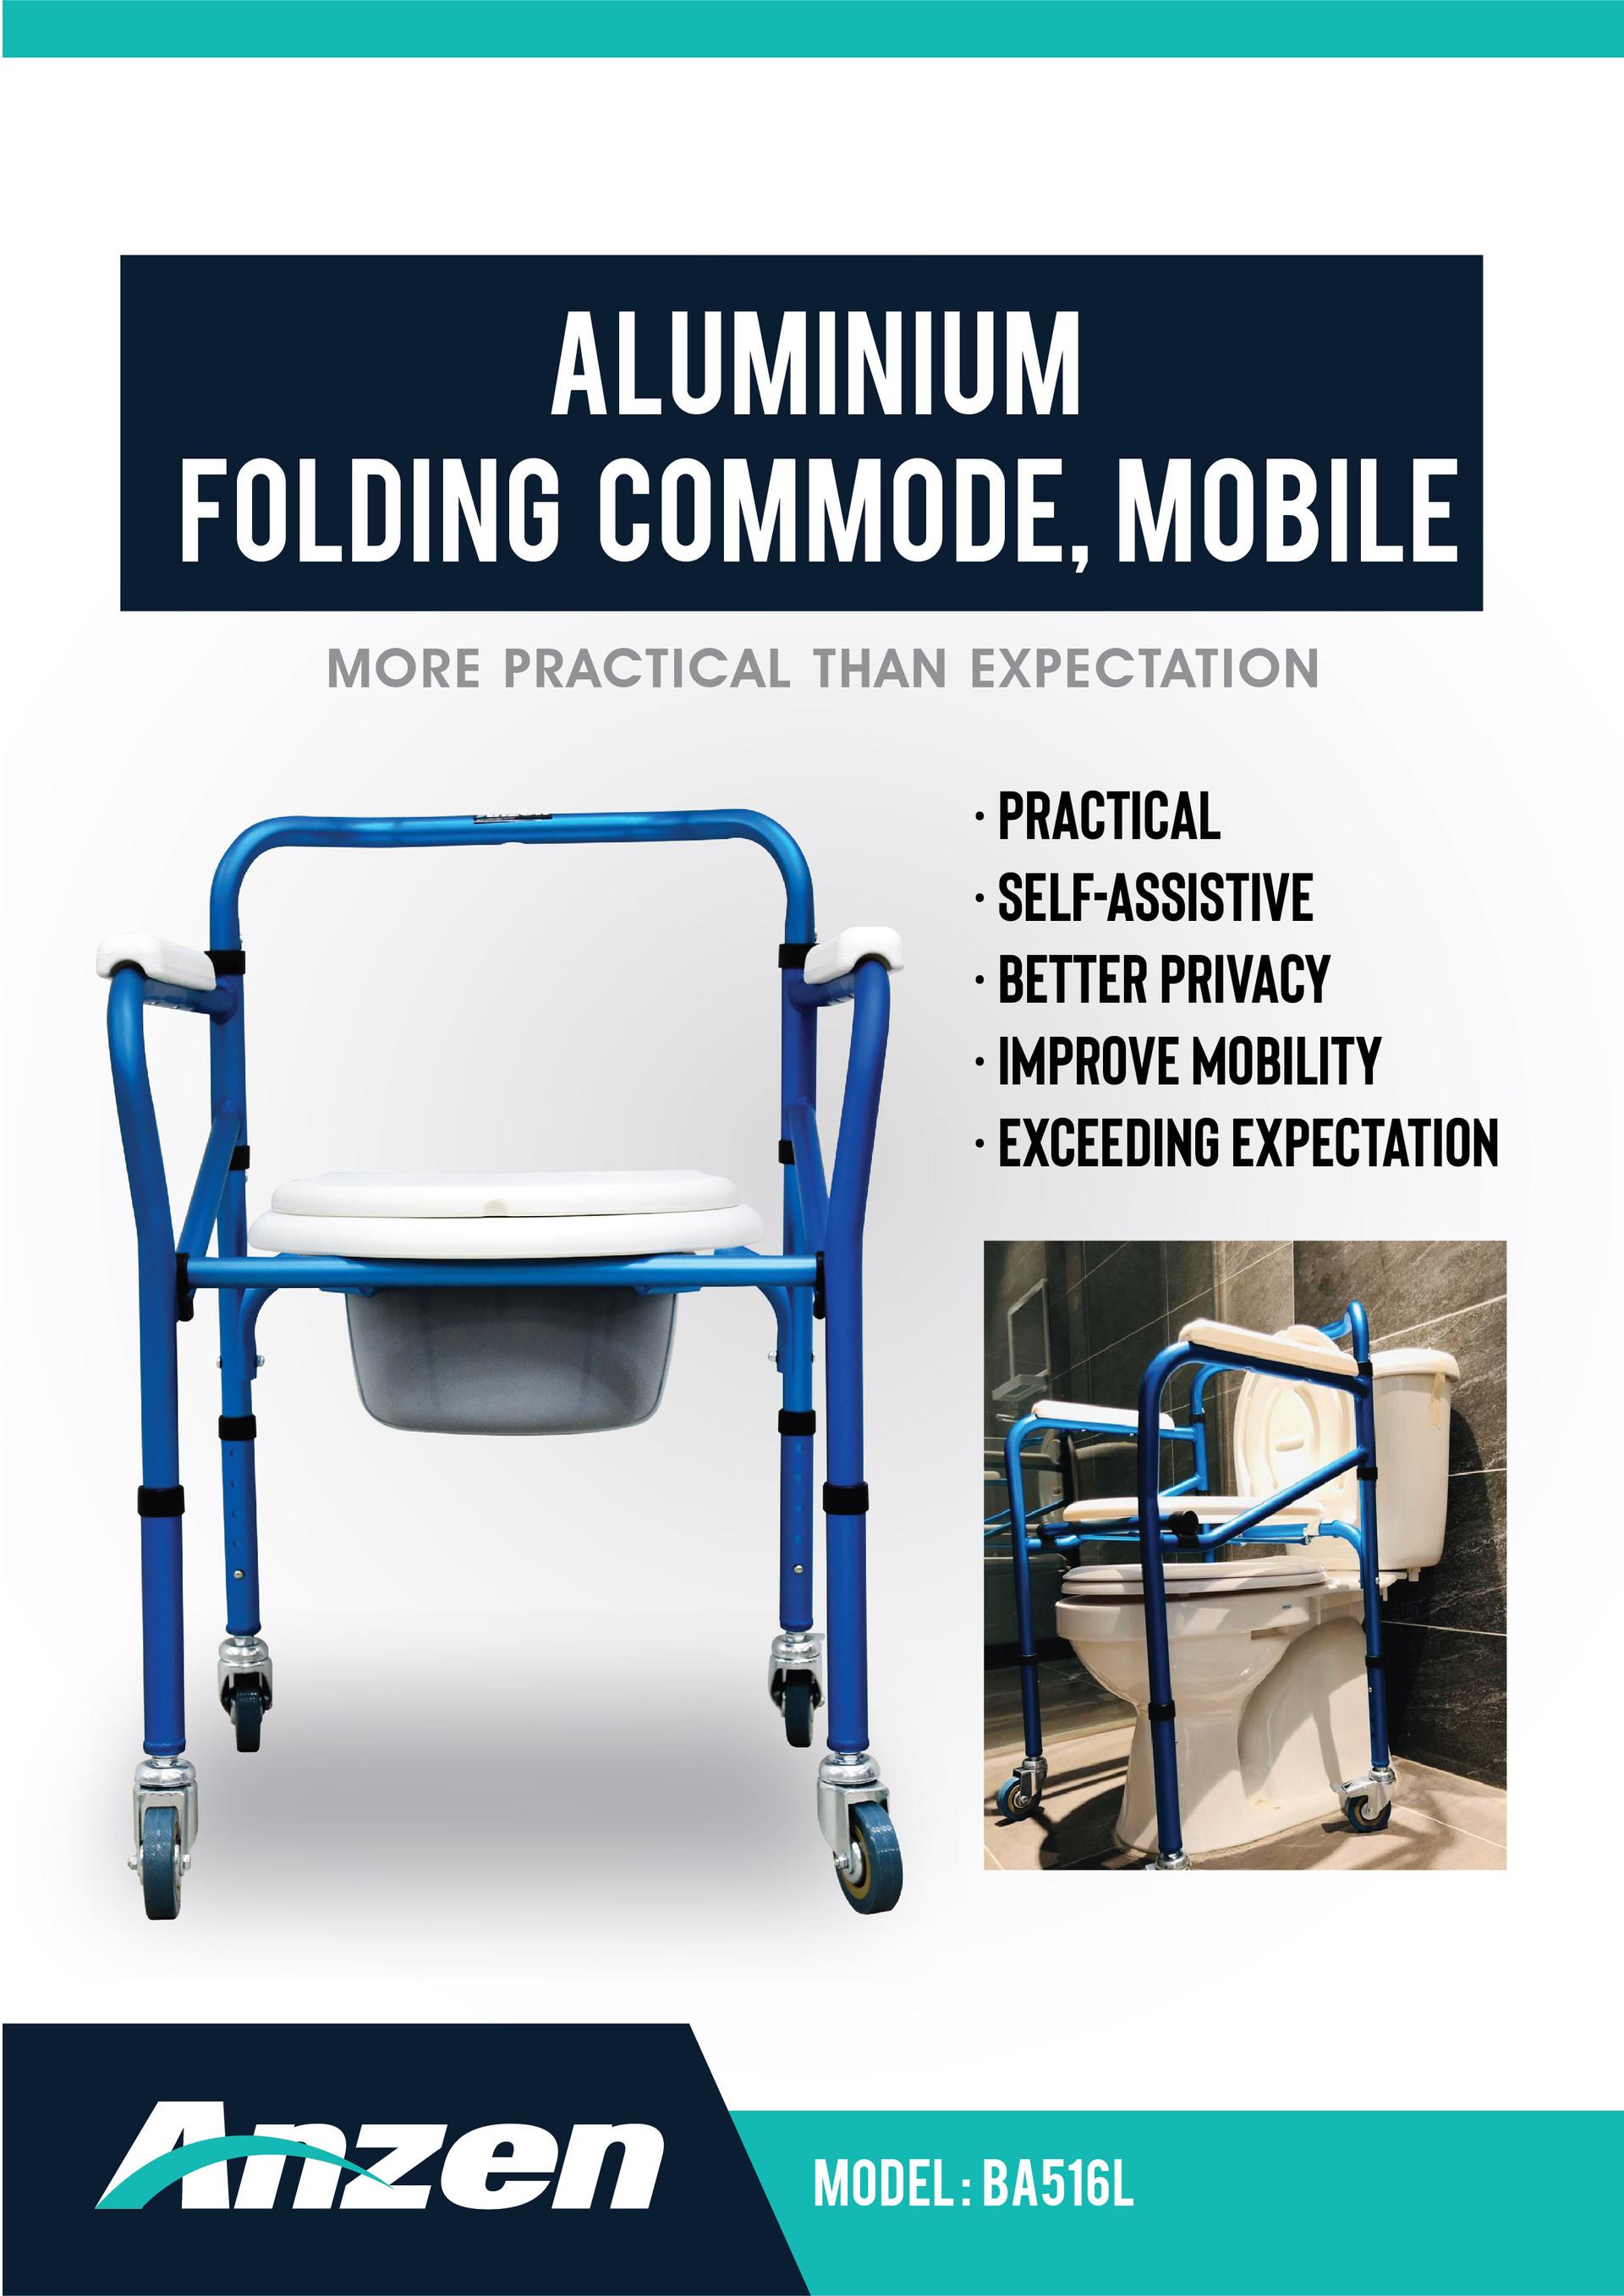 Commode Chair Mobile-21Jan2020-02.jpg